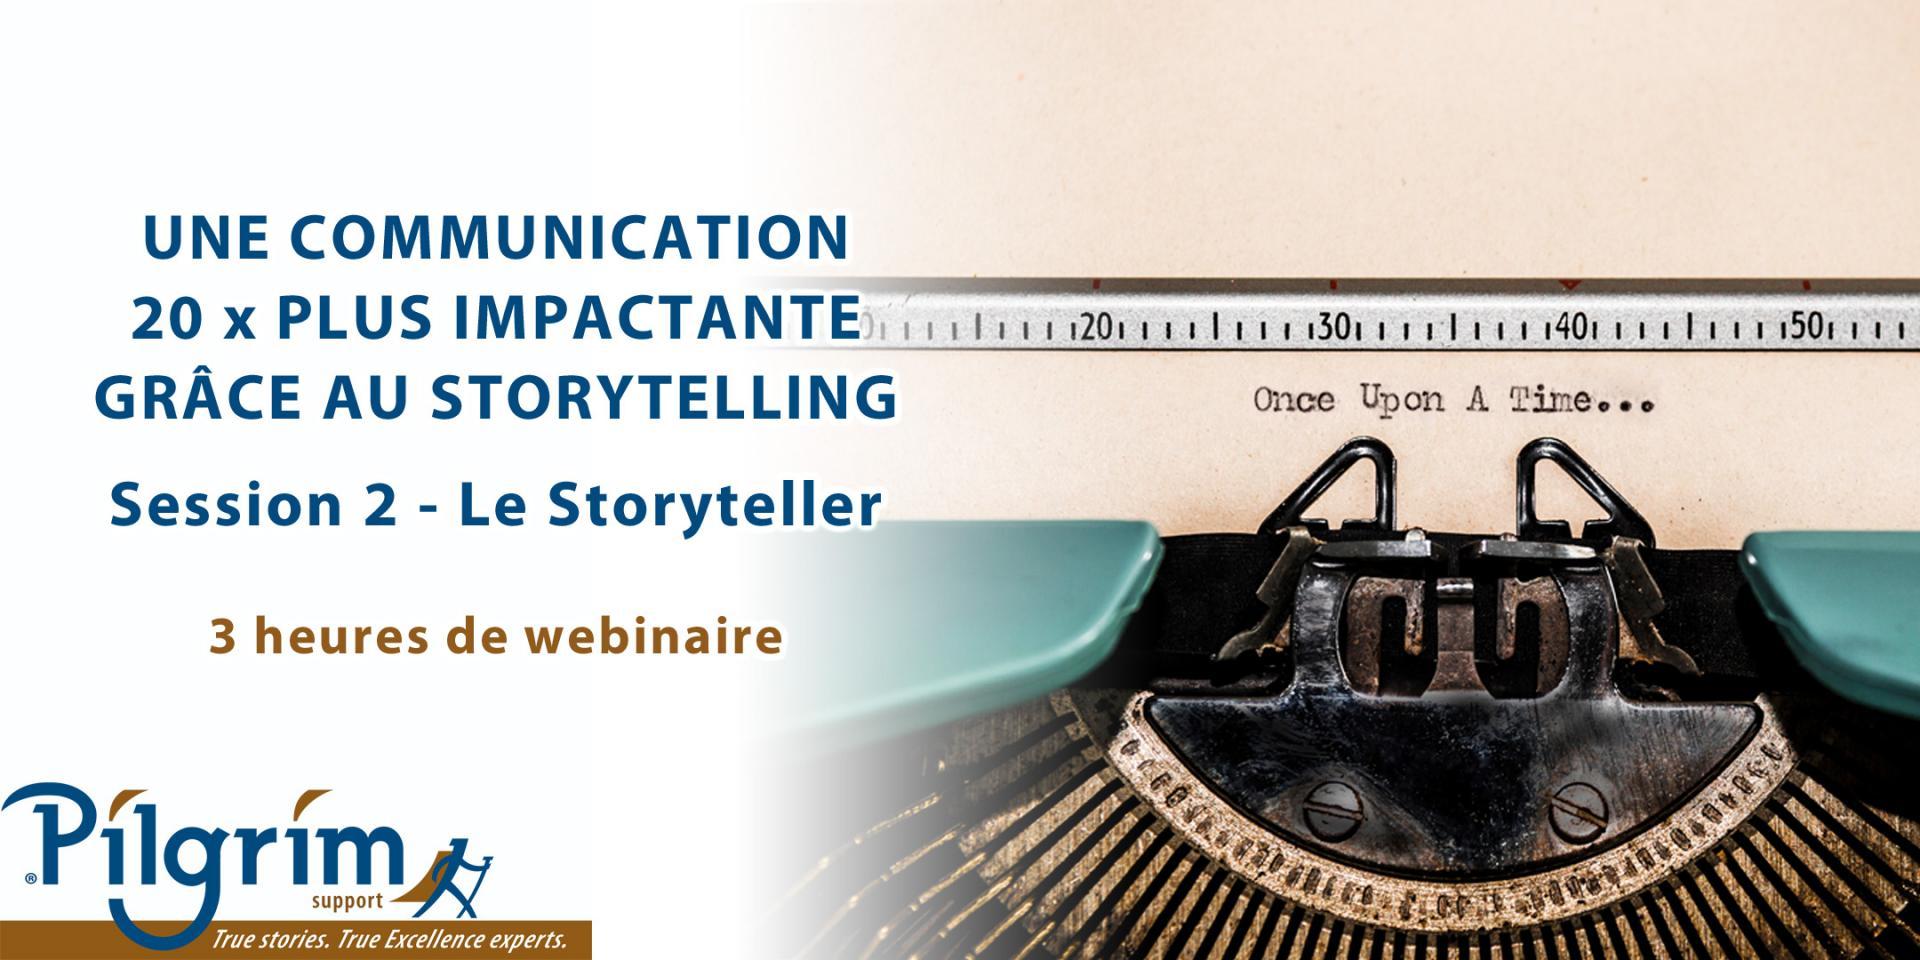 Pilgrim eventbrite event storytelling jan 2021 3